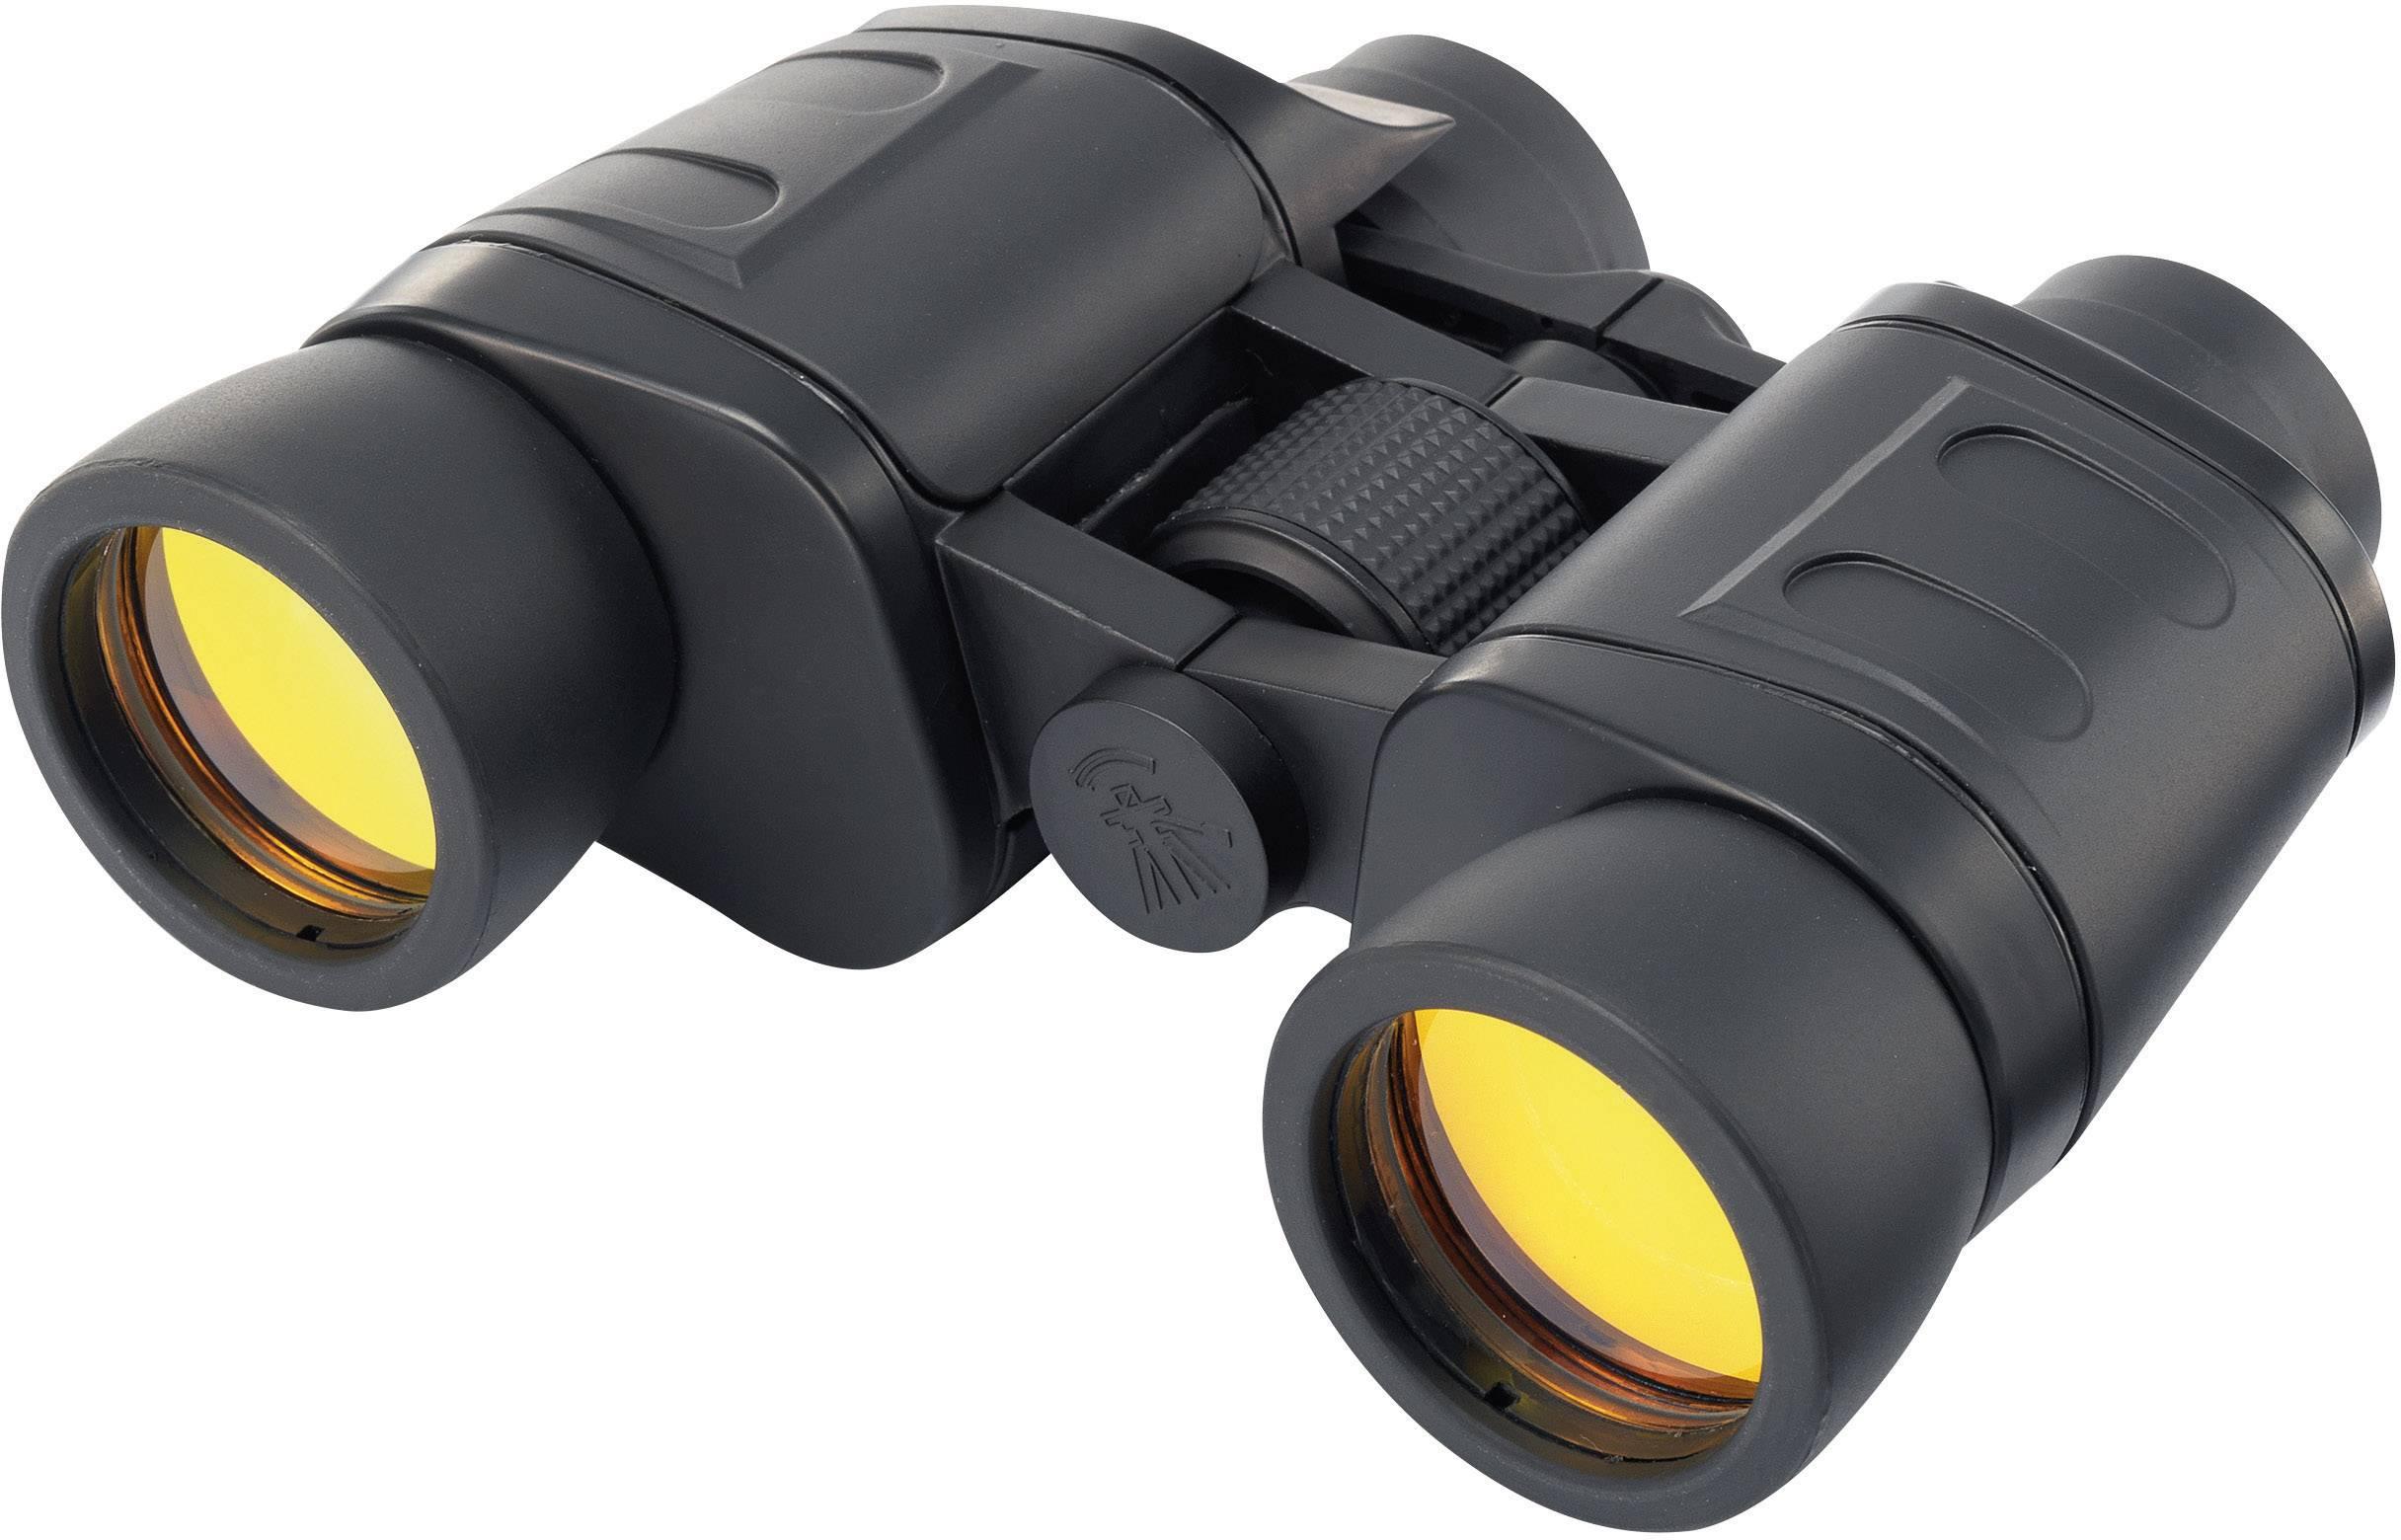 Ďalekohľad Renkforce 8x40 Binocular, čierna